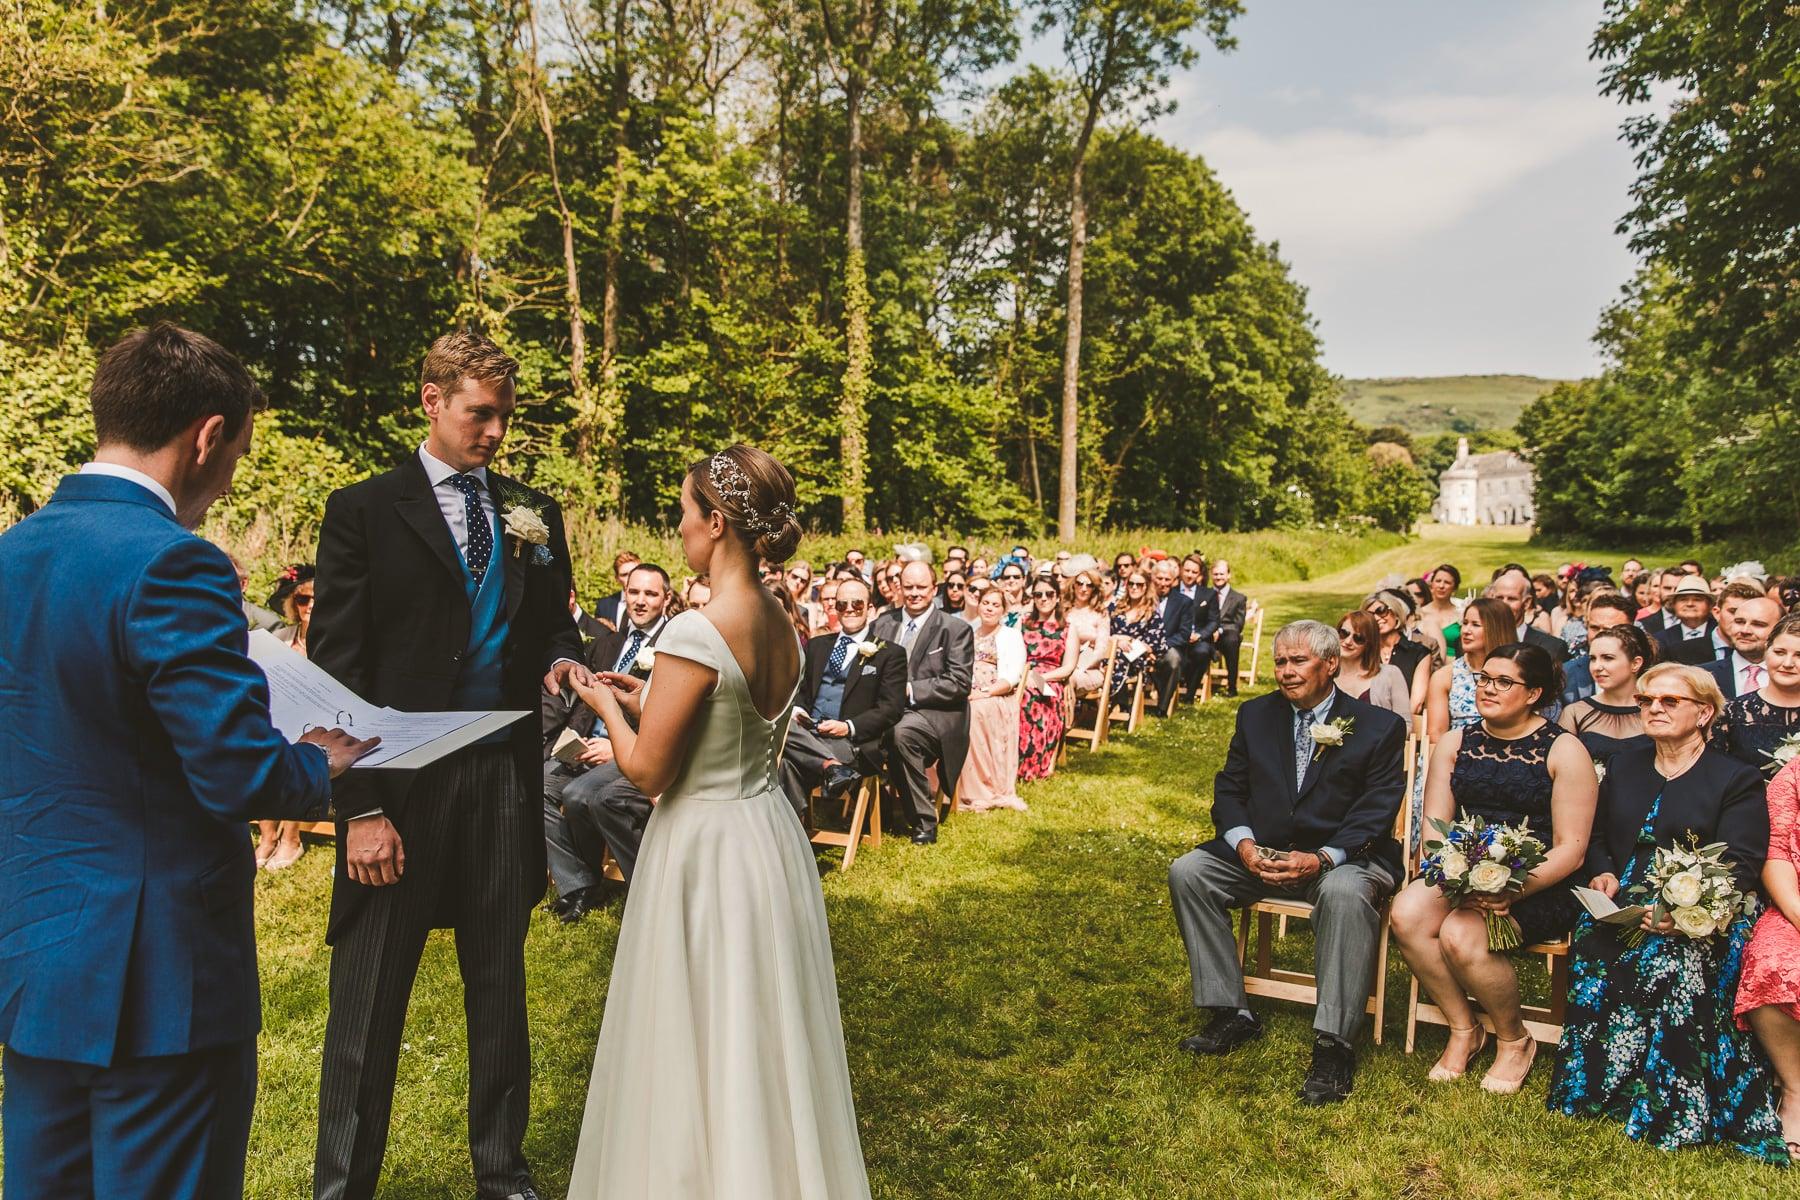 Weddings at Smedmore House Dorset